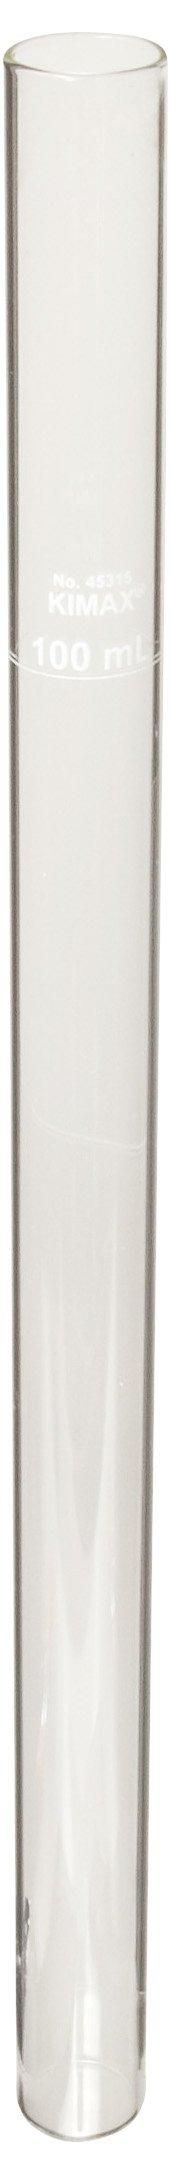 Kimble 45315A-50 Borosilicate Glass 50mL Nessler APHA Standard Color Comparison Tube (Matched Set of 6)